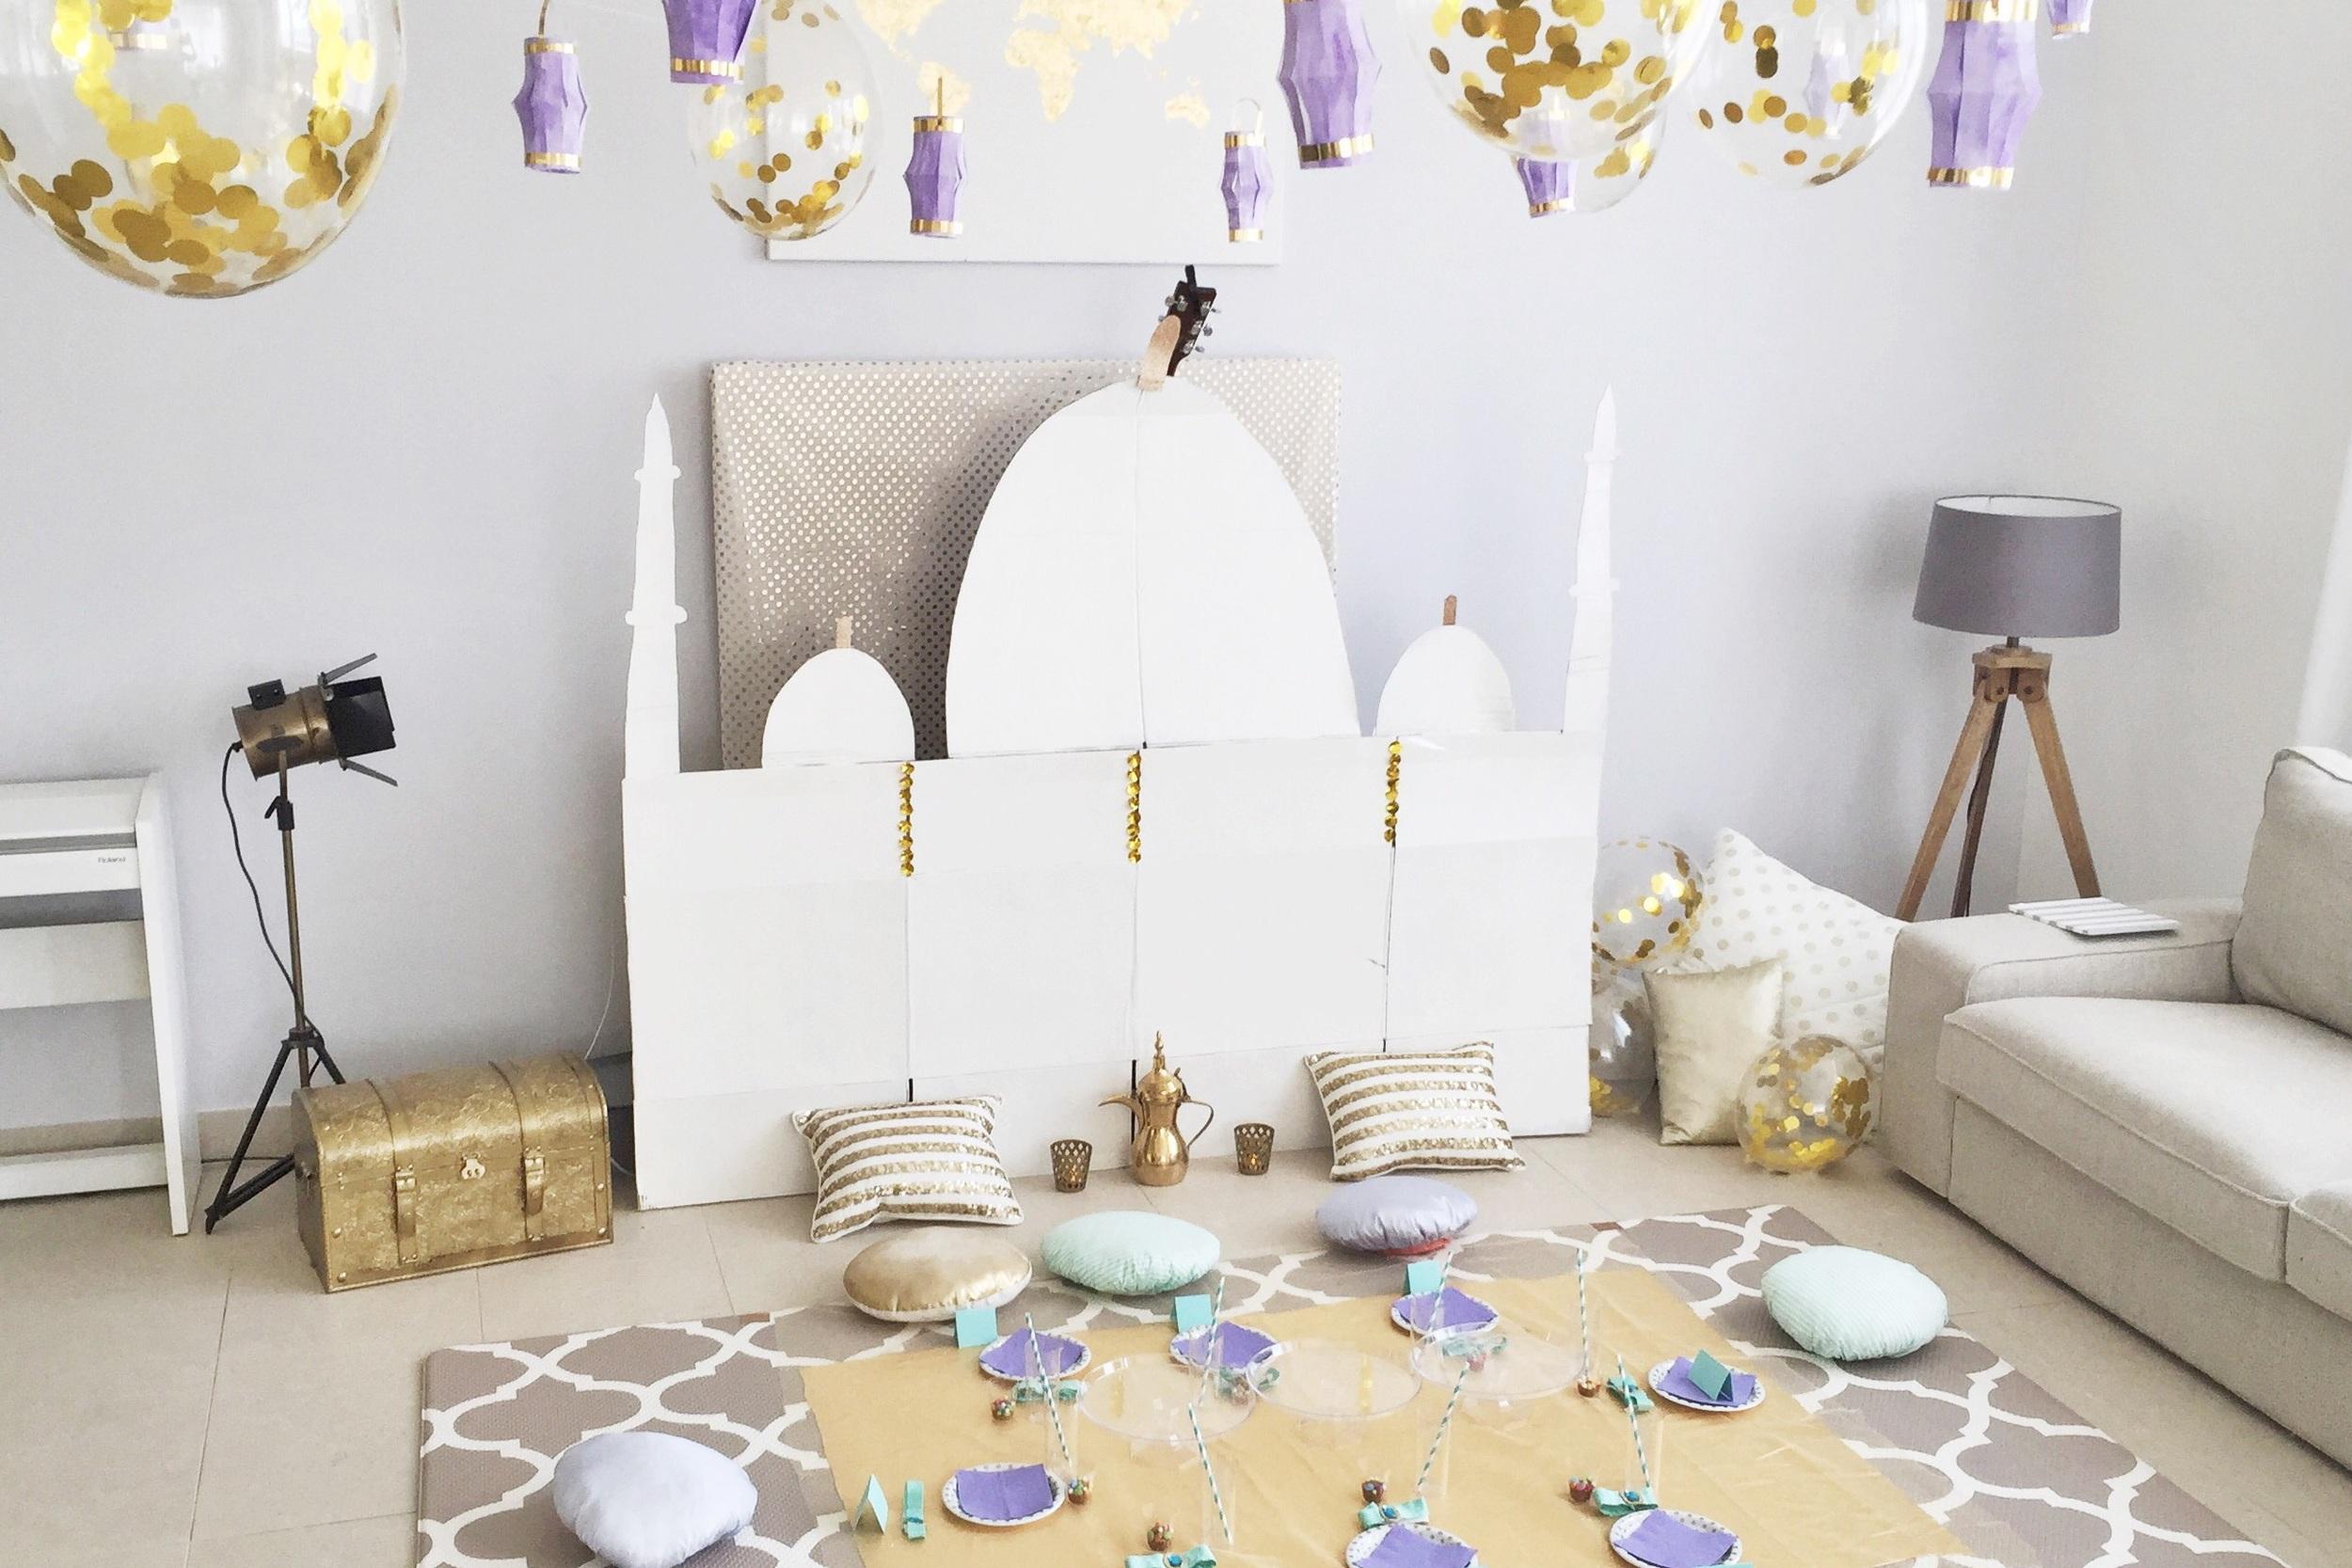 arabian nights living room decor modern rustic party a whole new world meg made